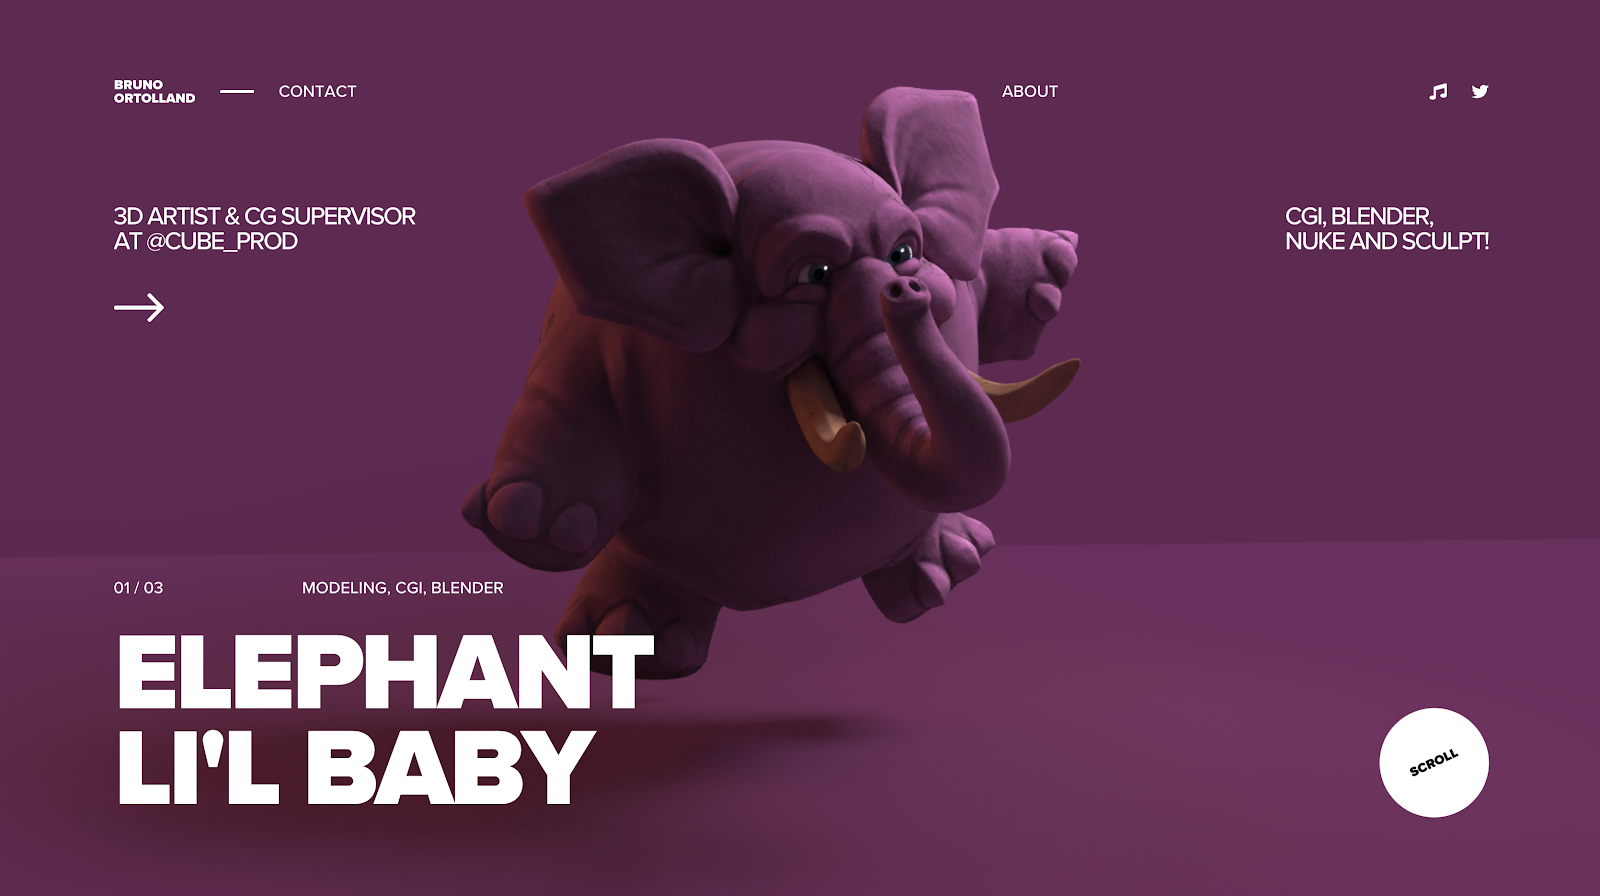 animated rendering of purple elephant